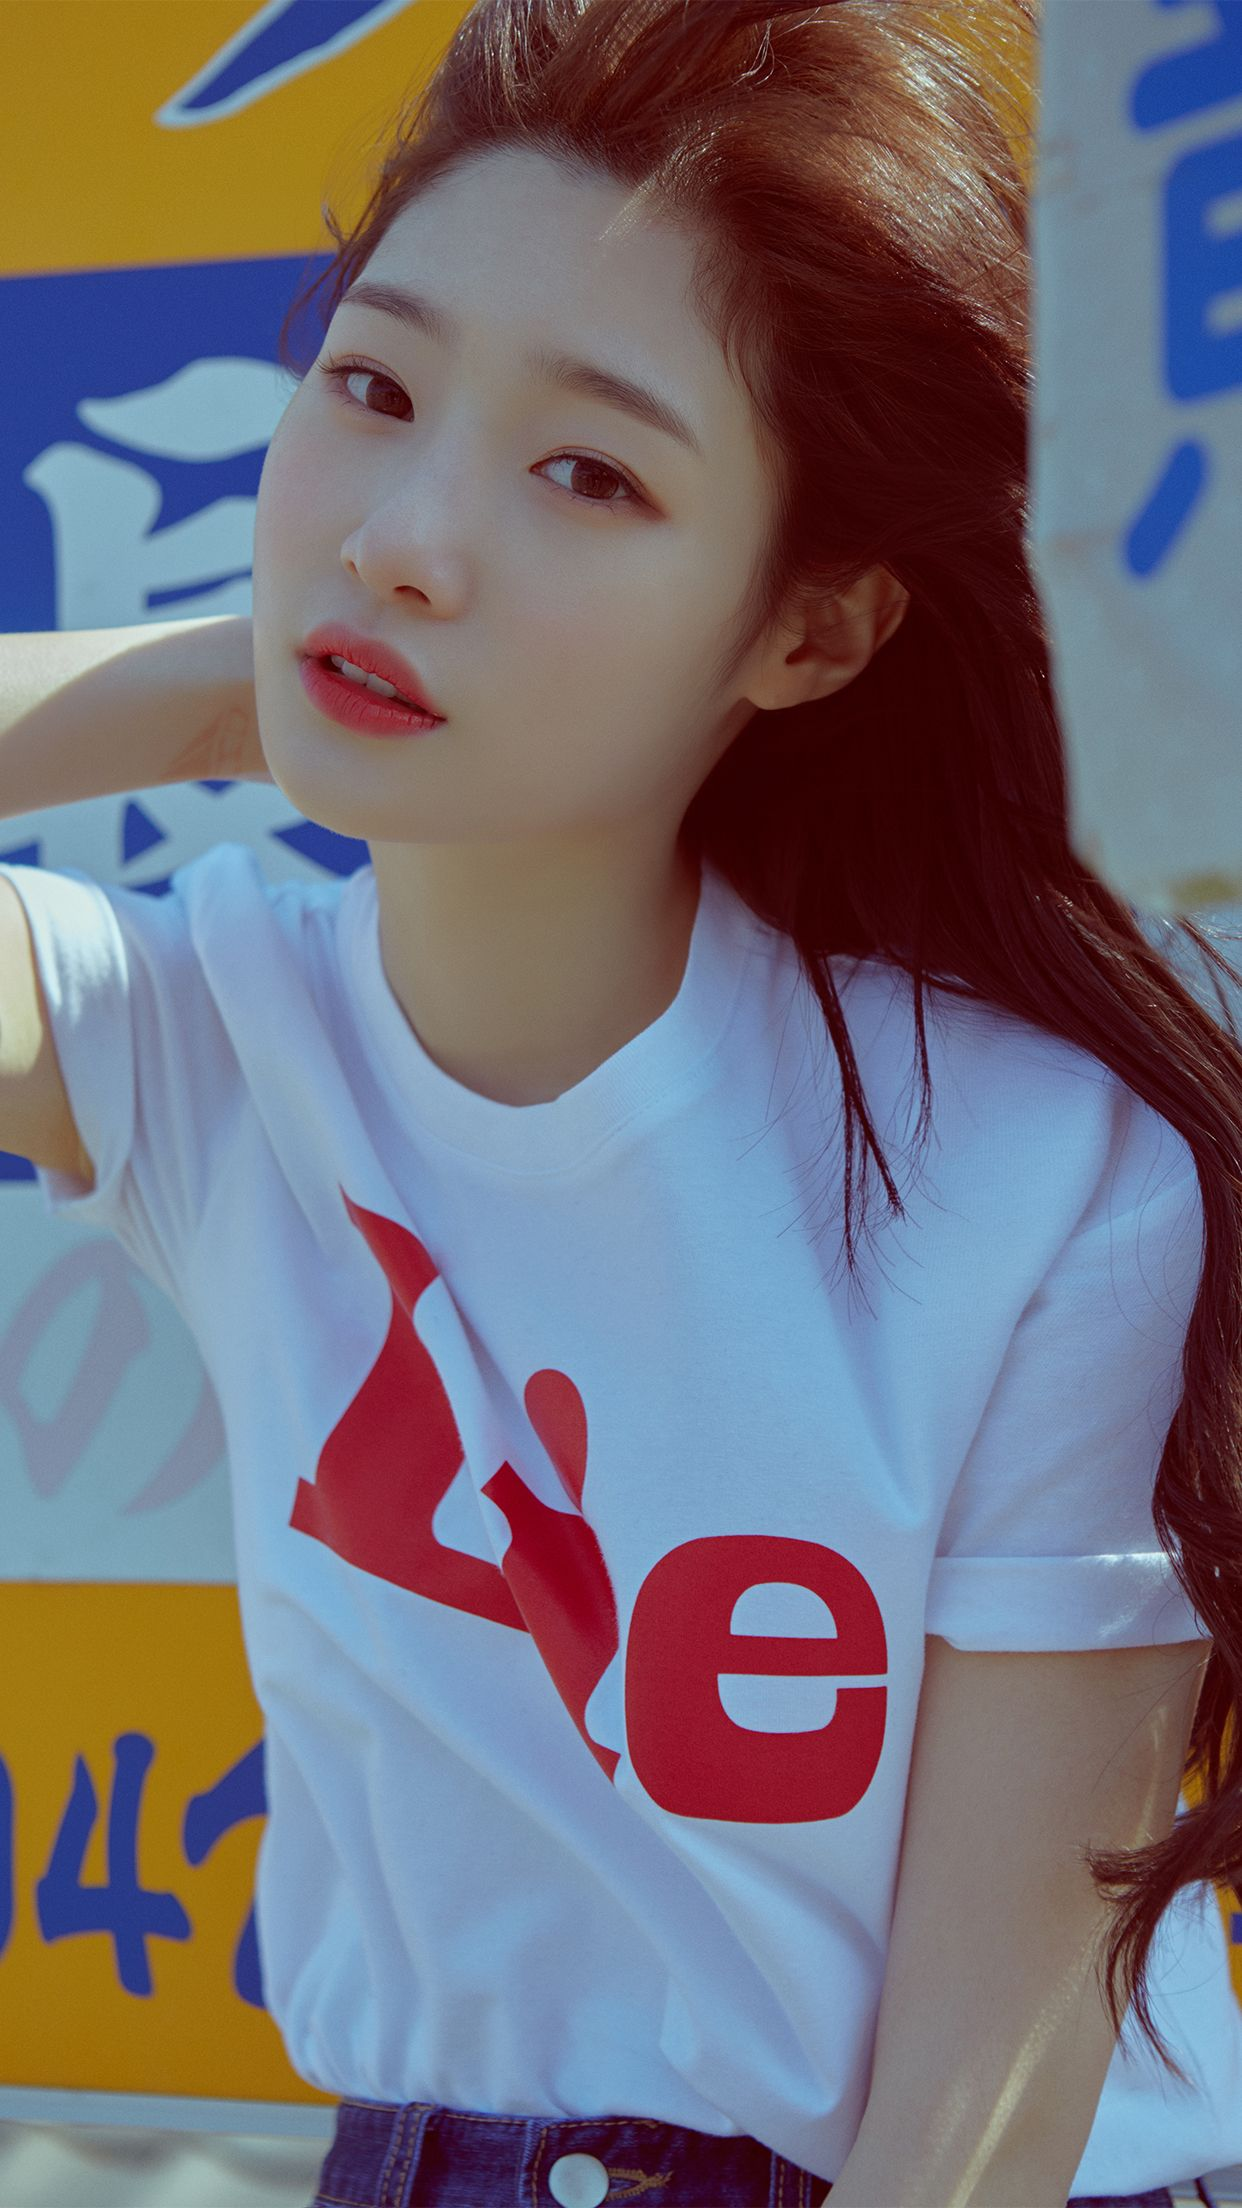 iPhone Wallpaper DIA JungChaeYeon ChaeYeon 1242x2208